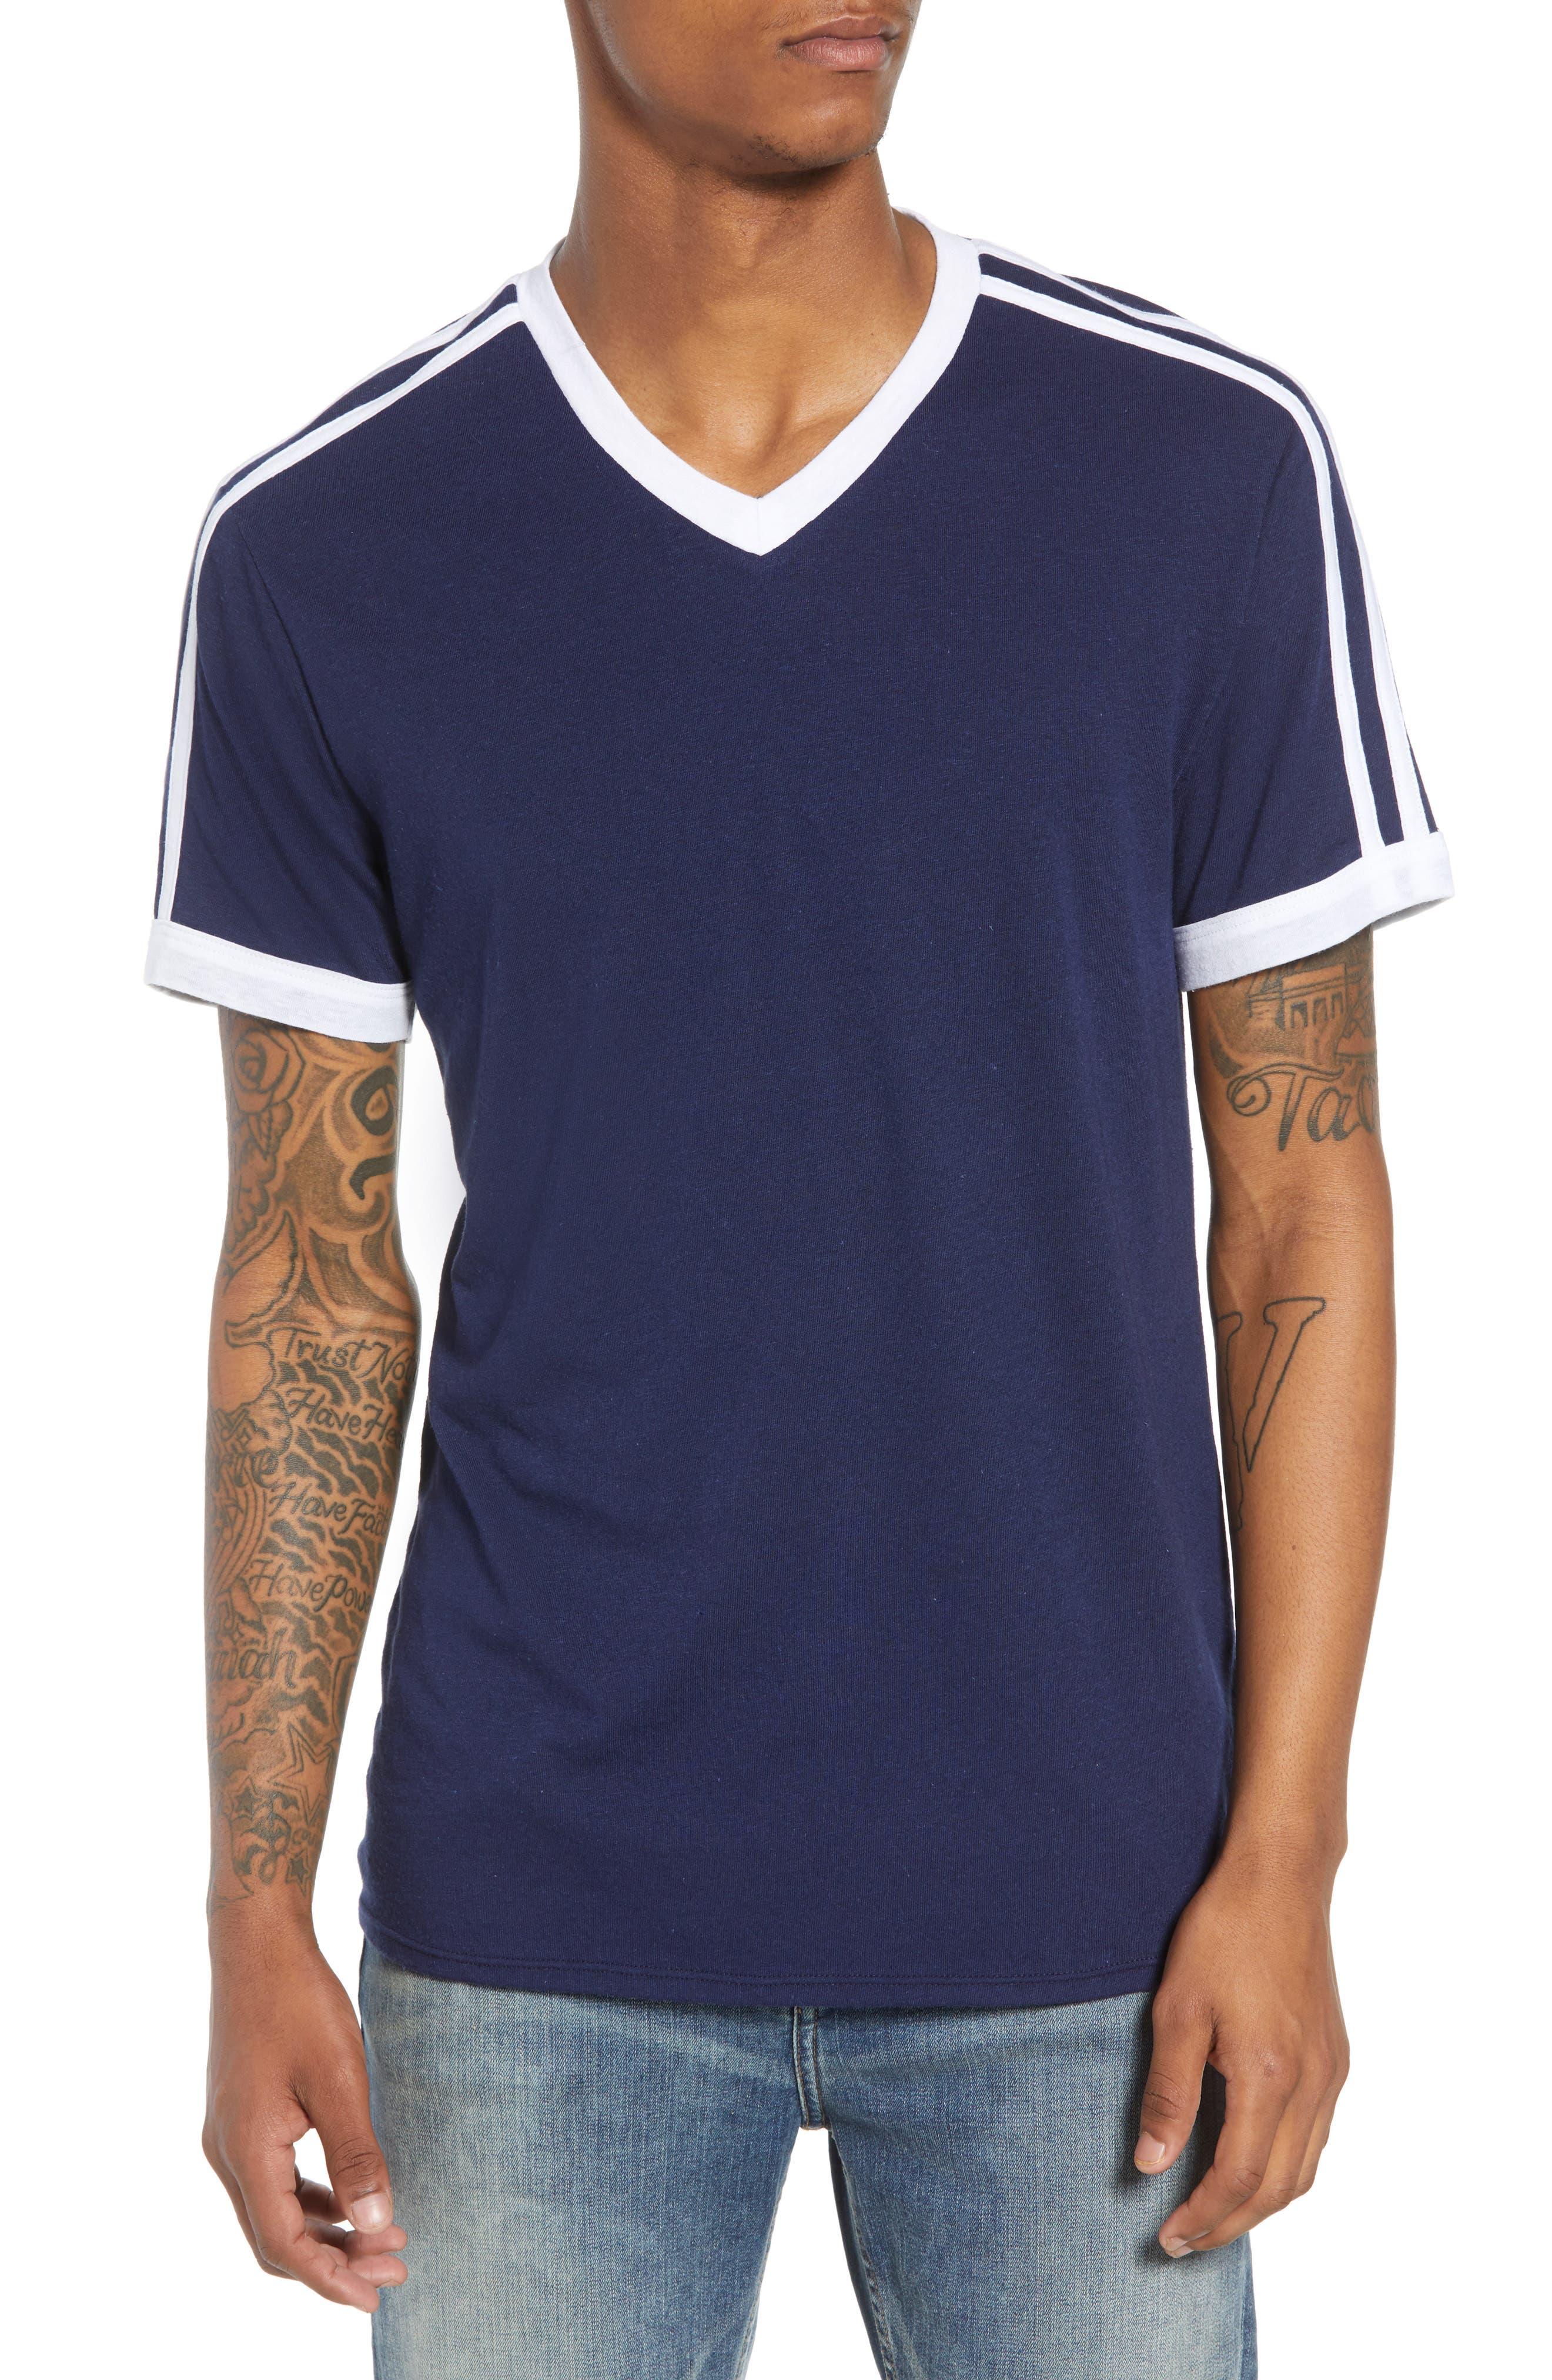 Vintage Athletic V-Neck T-Shirt,                             Main thumbnail 1, color,                             410